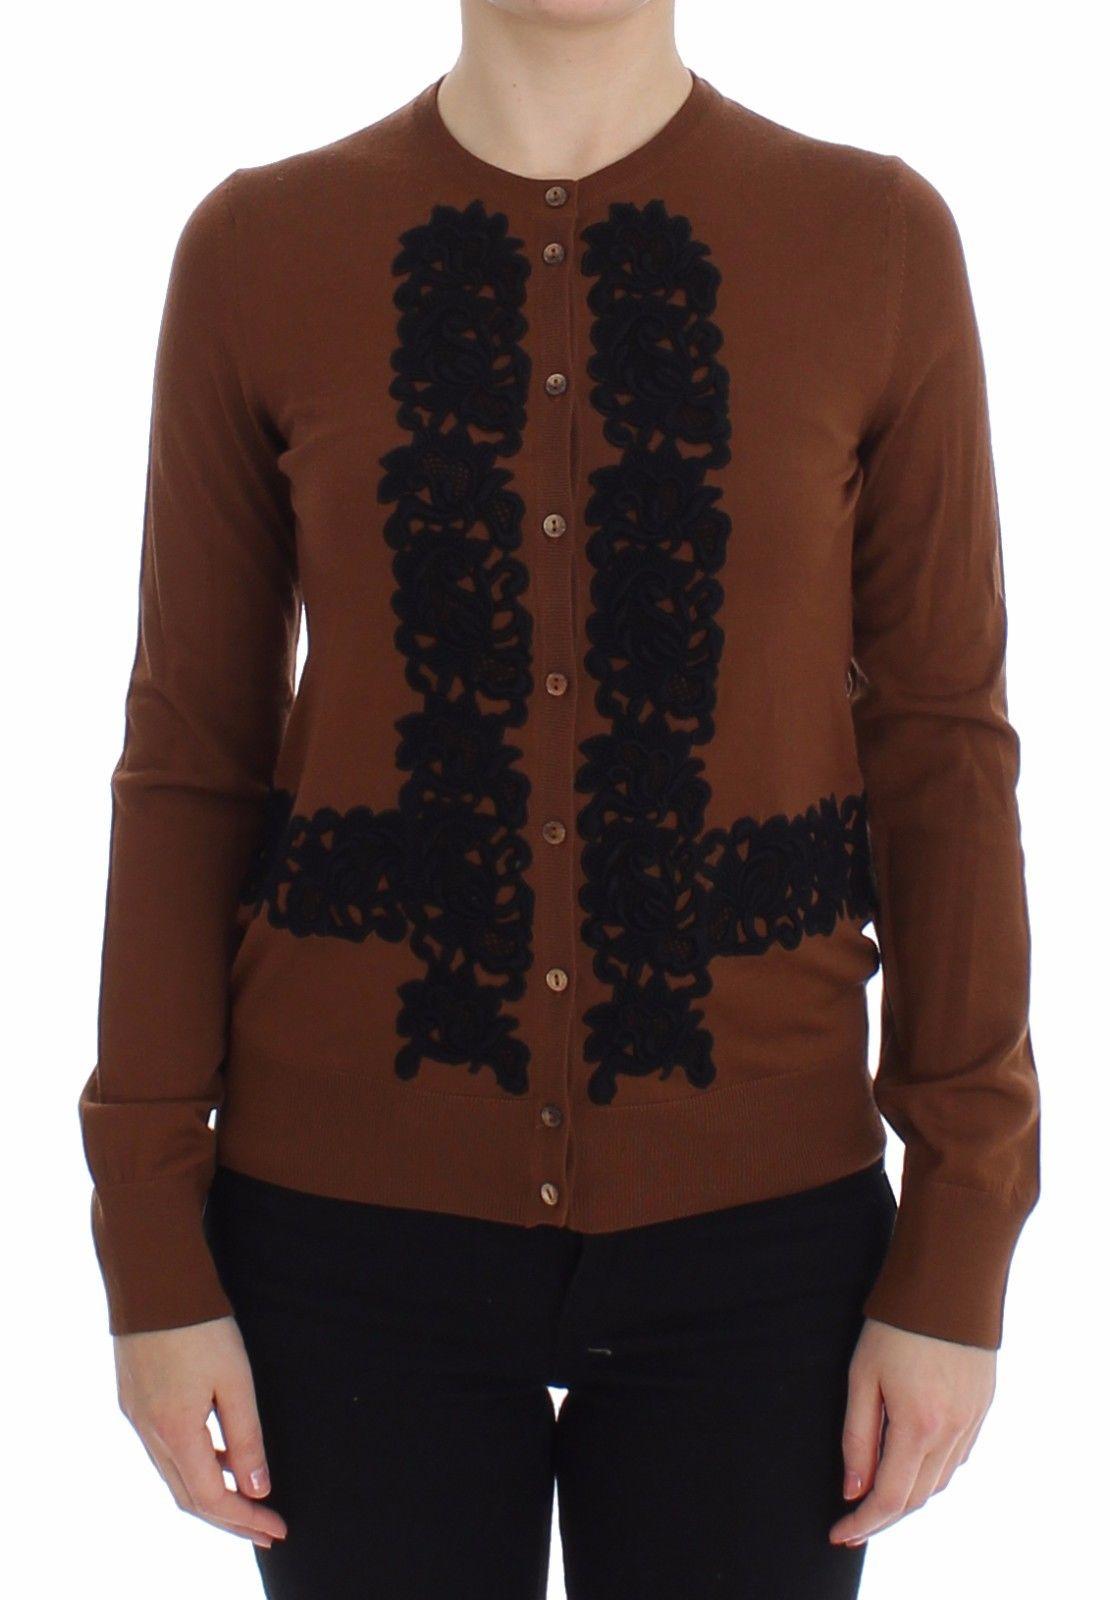 Dolce & Gabbana Women's Wool Lace Cardigan Brown SIG13277 - IT40 S